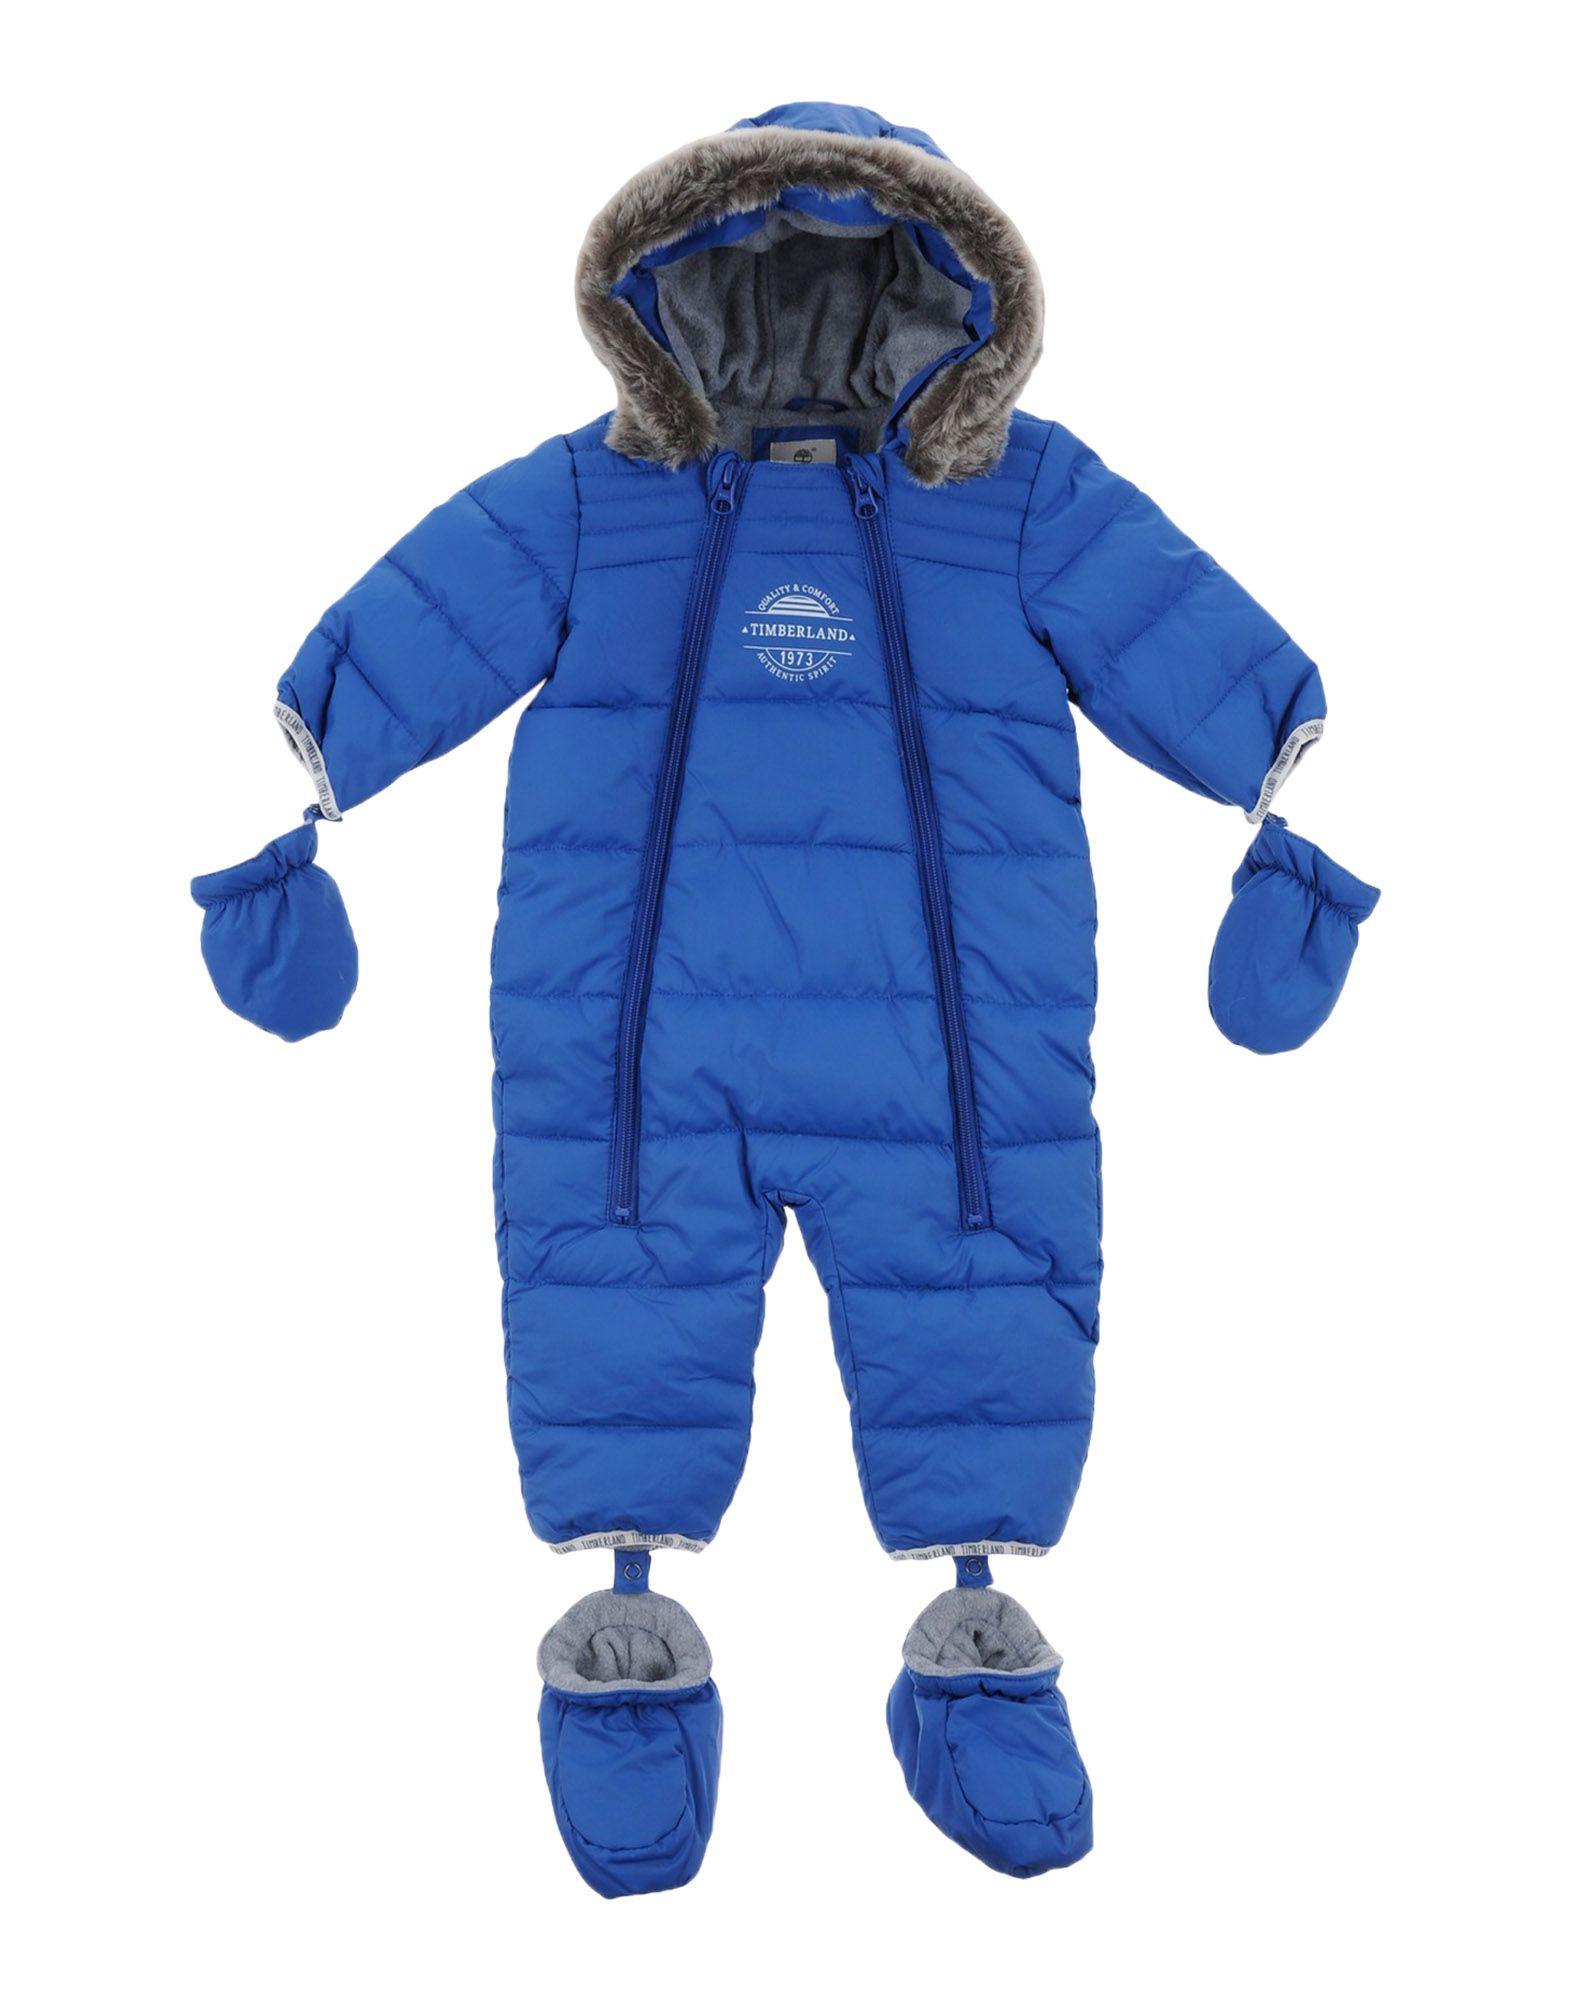 Timberland - Coats & Jackets - Snow Wear - On Yoox.com